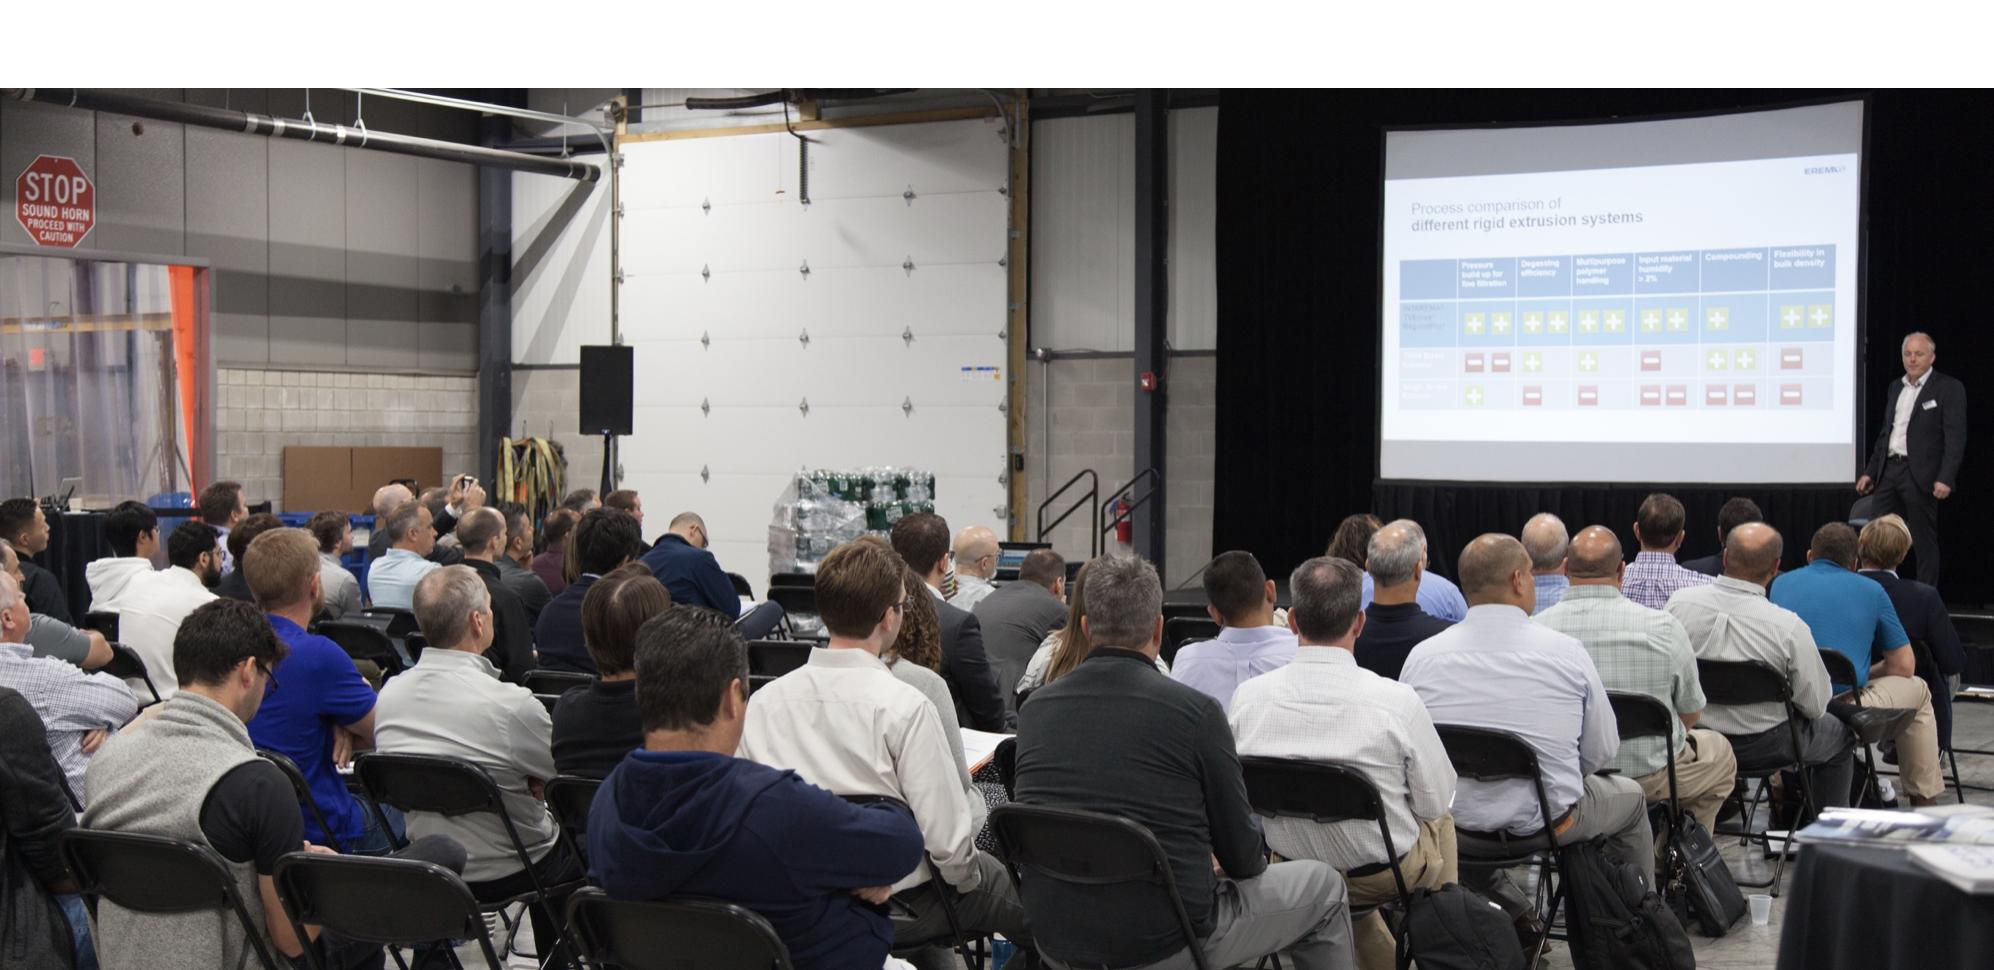 EREMA Discovery Day 2019_ Closing the Plastics Loop Presentations